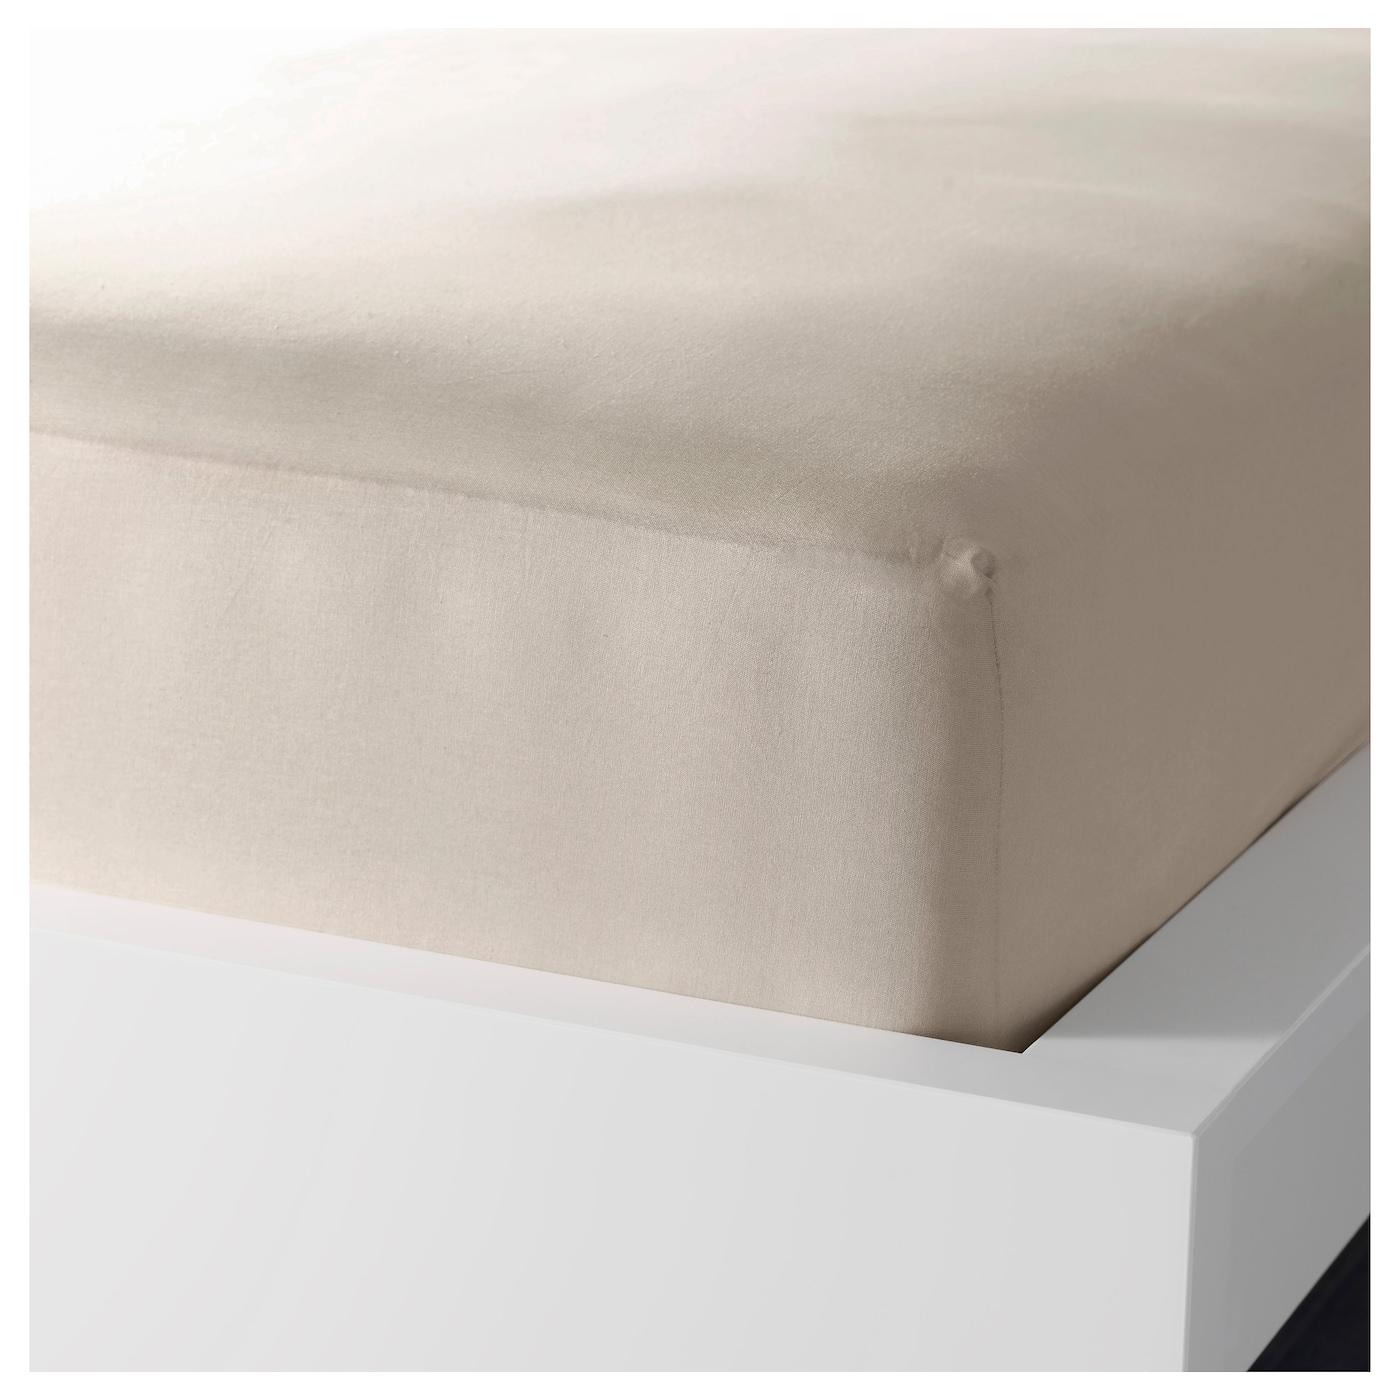 dvala drap housse beige 160 x 200 cm ikea. Black Bedroom Furniture Sets. Home Design Ideas